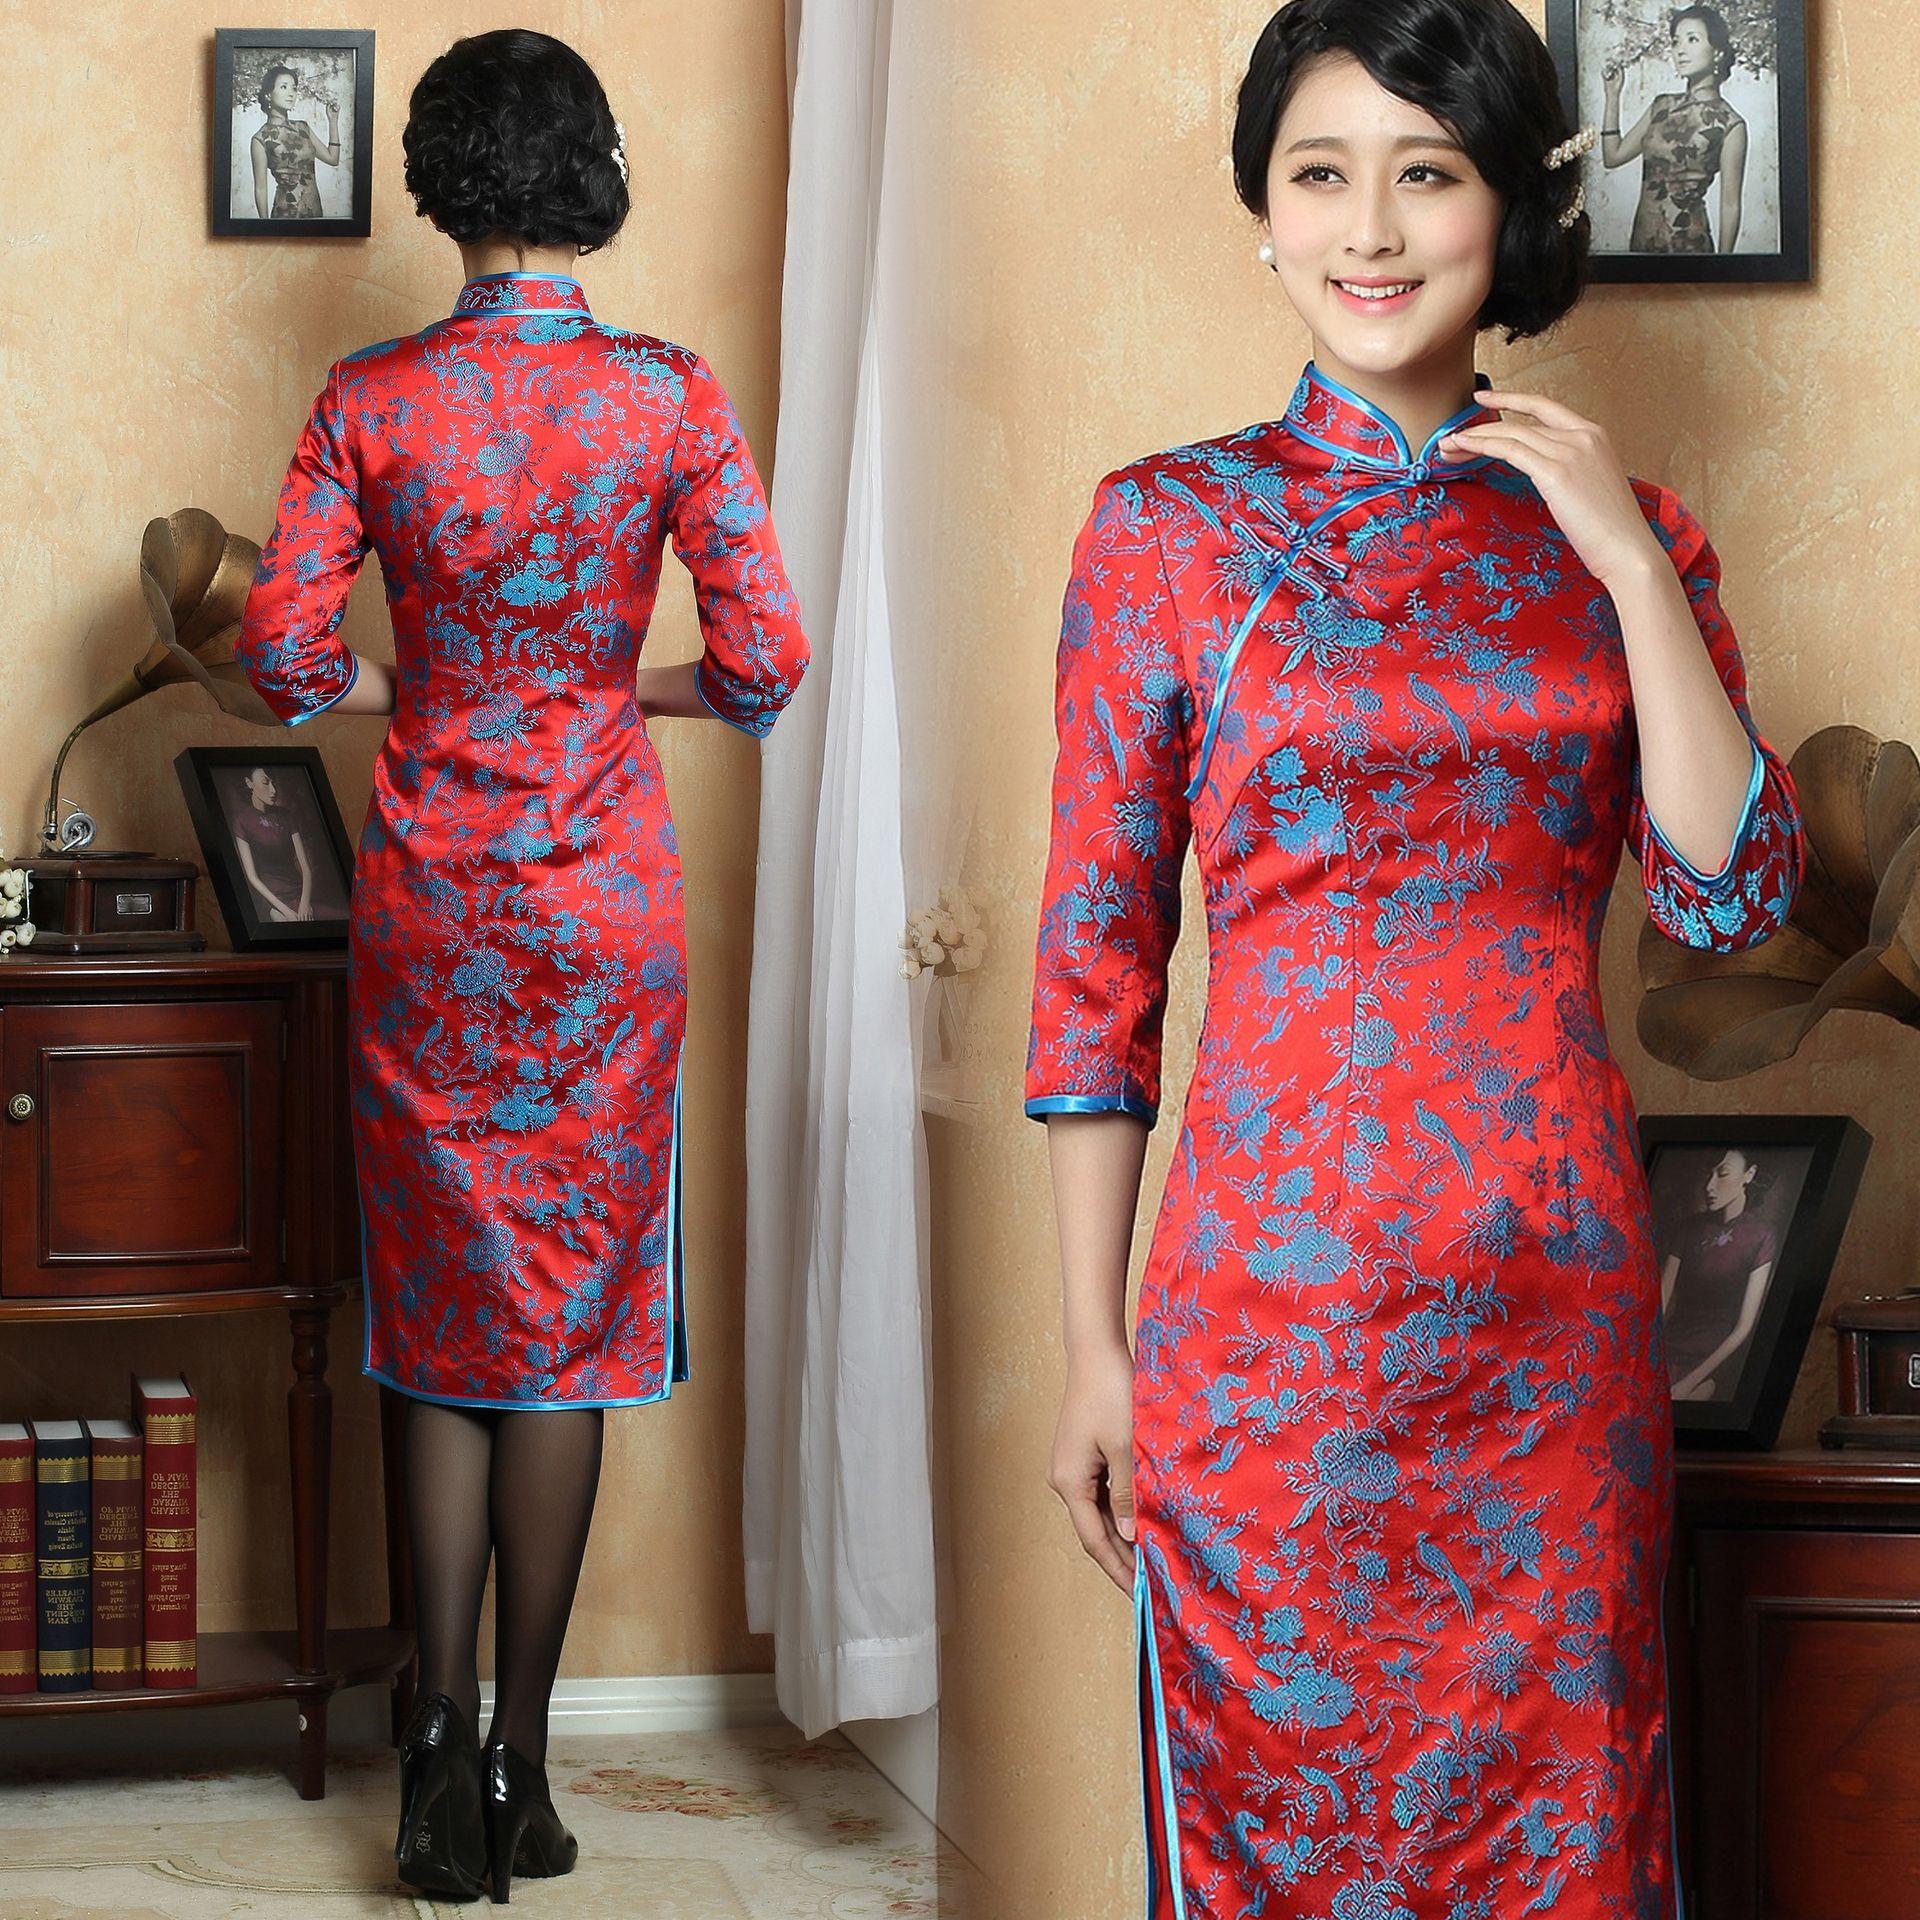 Long Sleeve Traditional Cheongsam Dress Chinese Dress Buy Chinese Bridal Dress Red Lace Wedding Dress Natural Linen Dress [ 1920 x 1920 Pixel ]